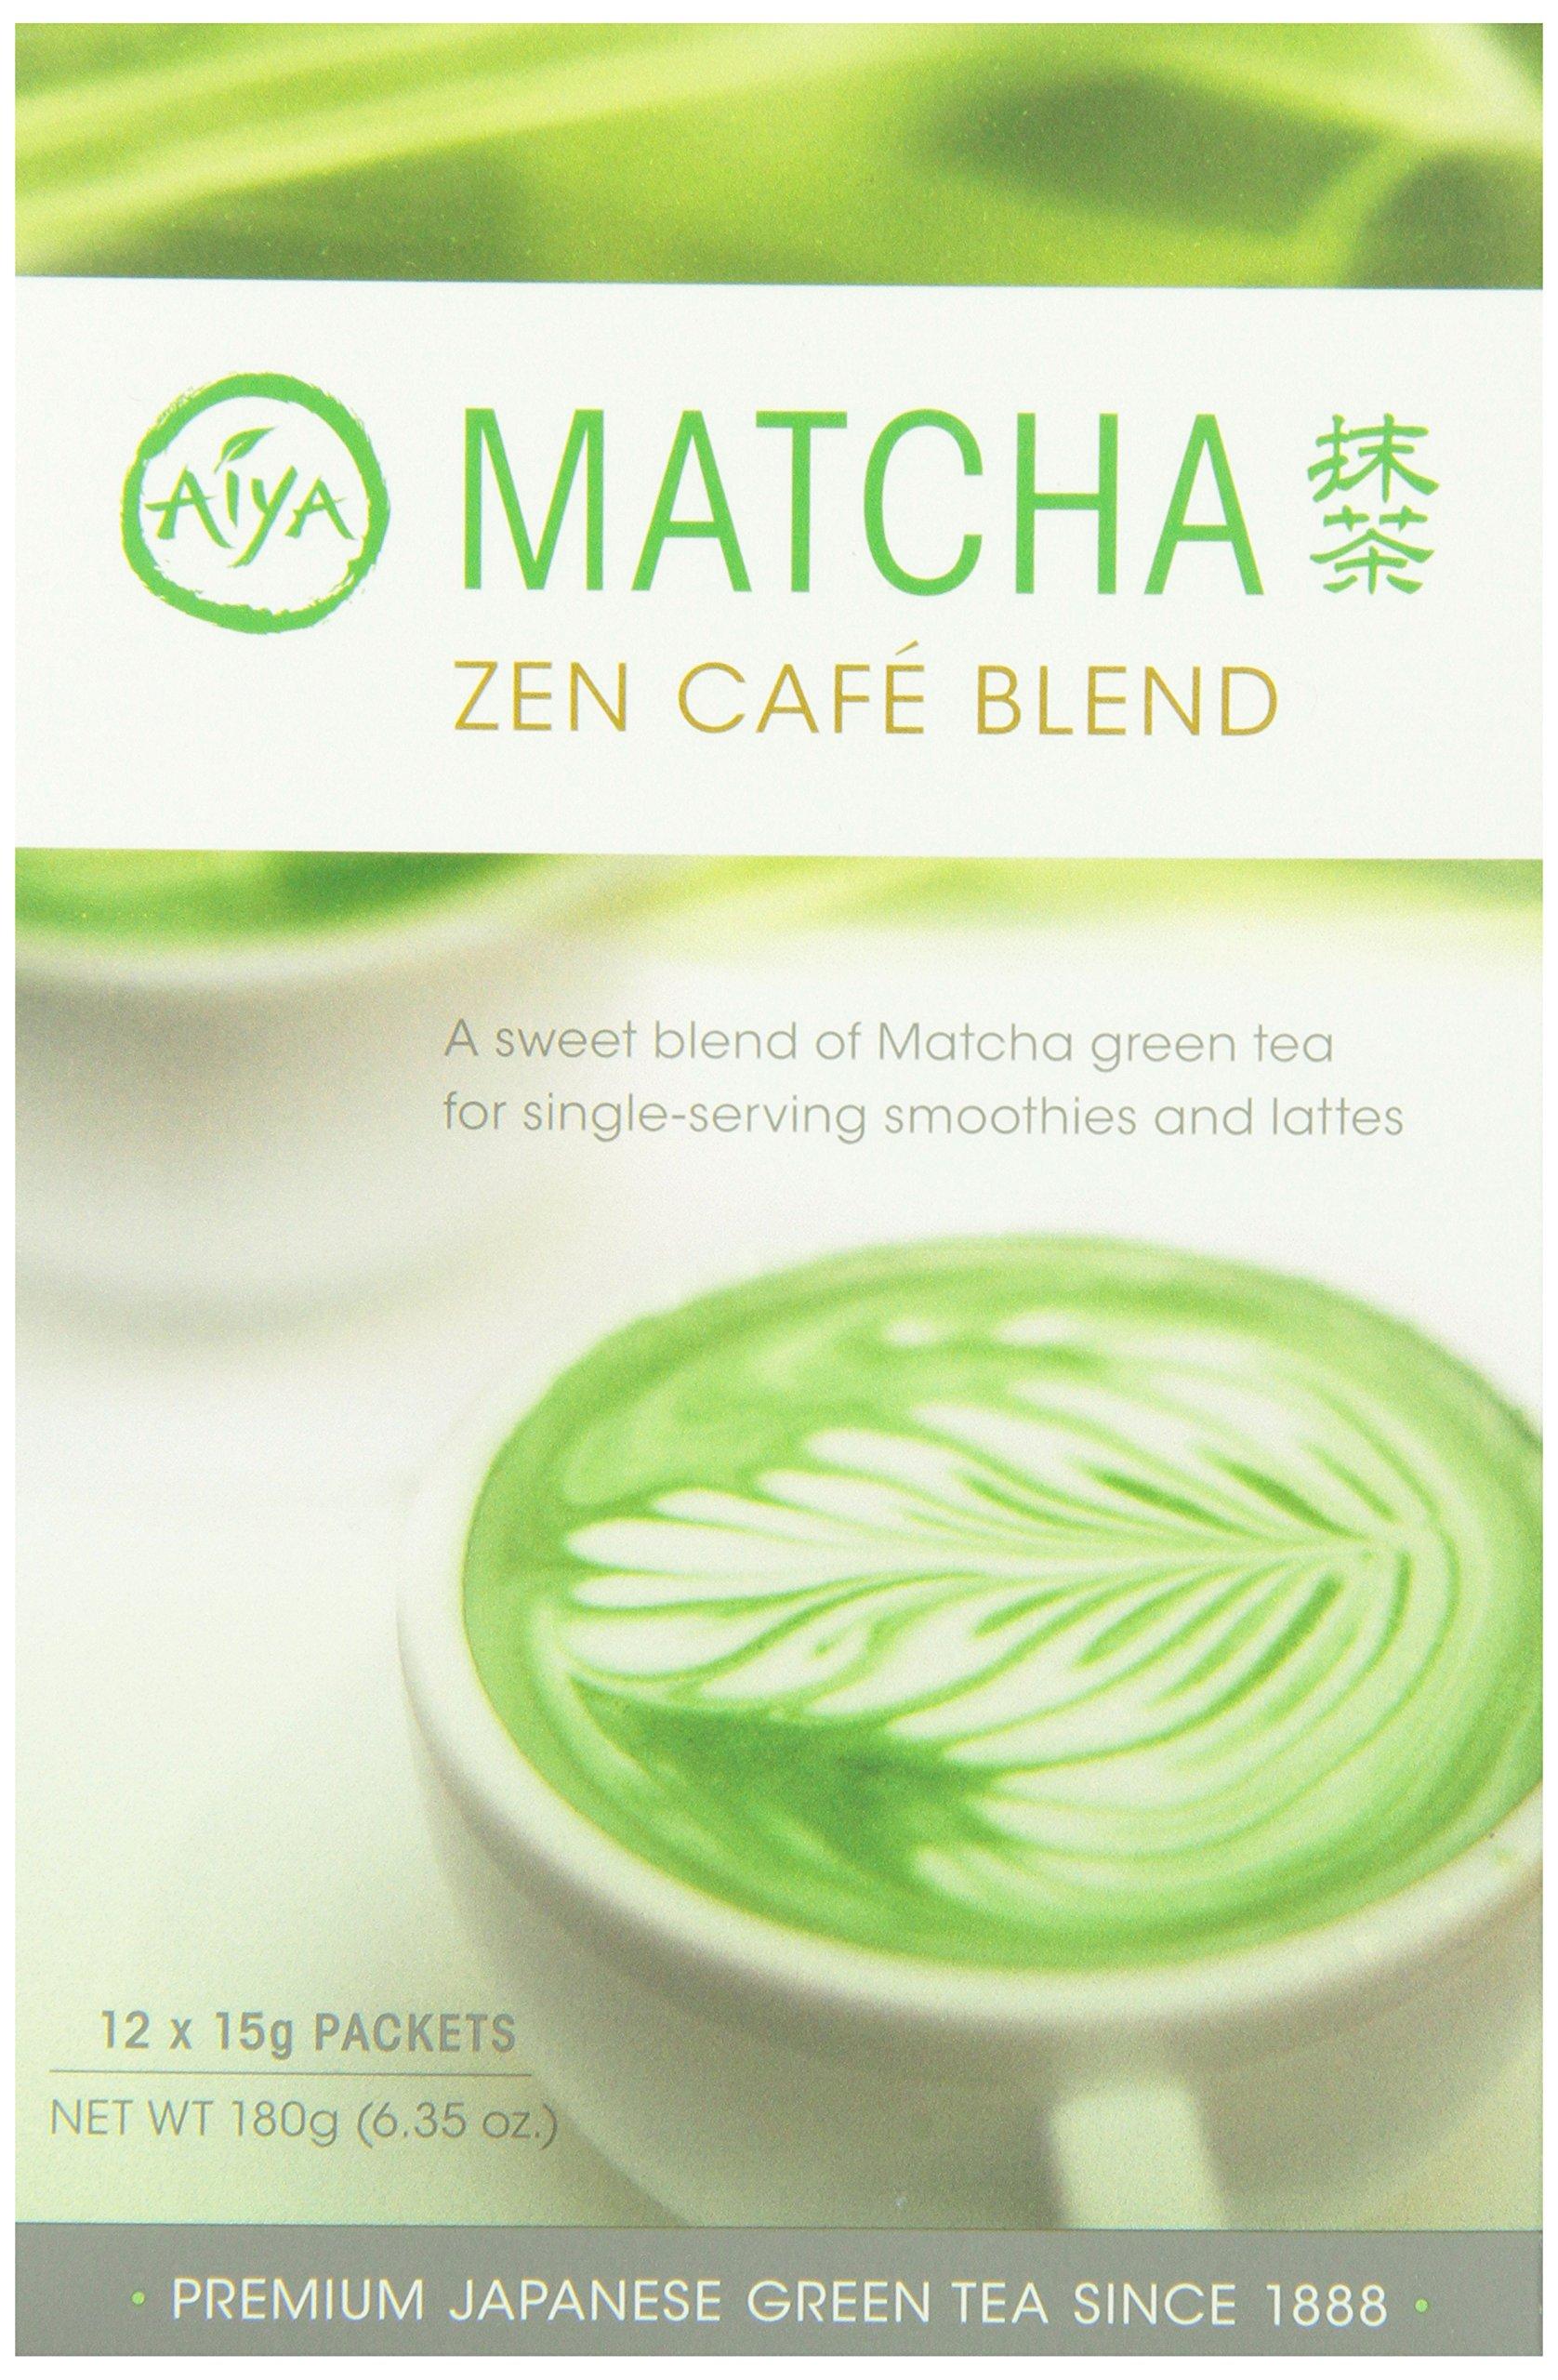 Aiya Matcha Zen Cafe blend stick packs 12ct (1 box)